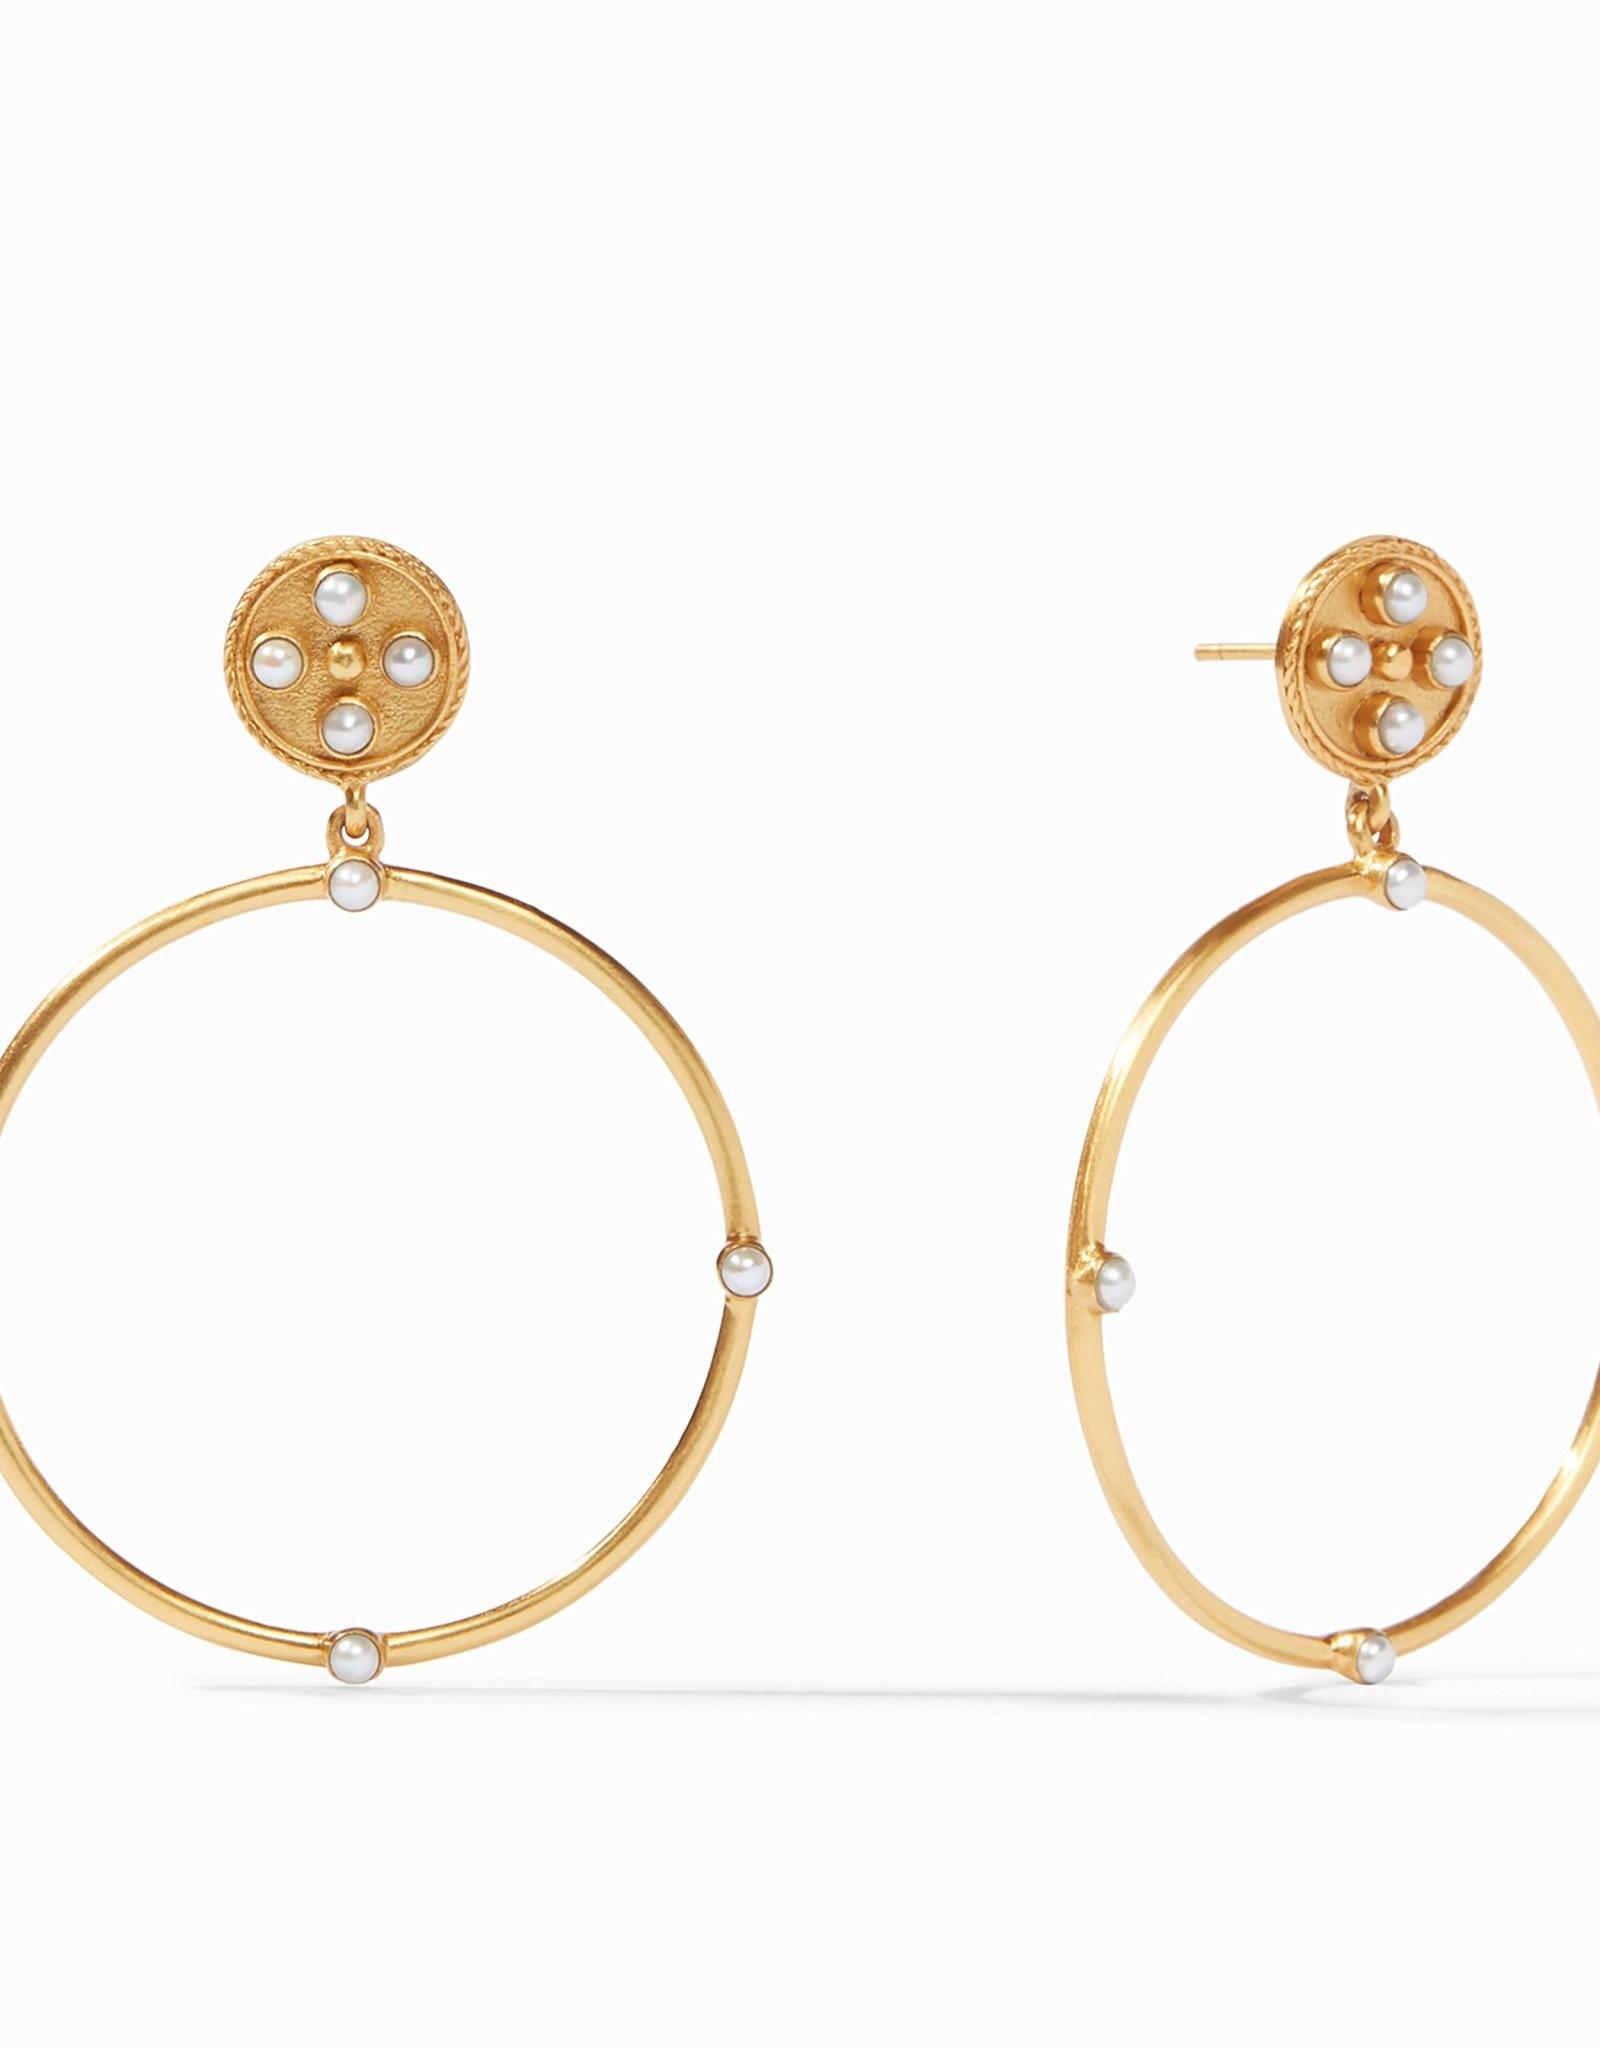 Julie Vos Paris Statement Earrings Gold Pearl